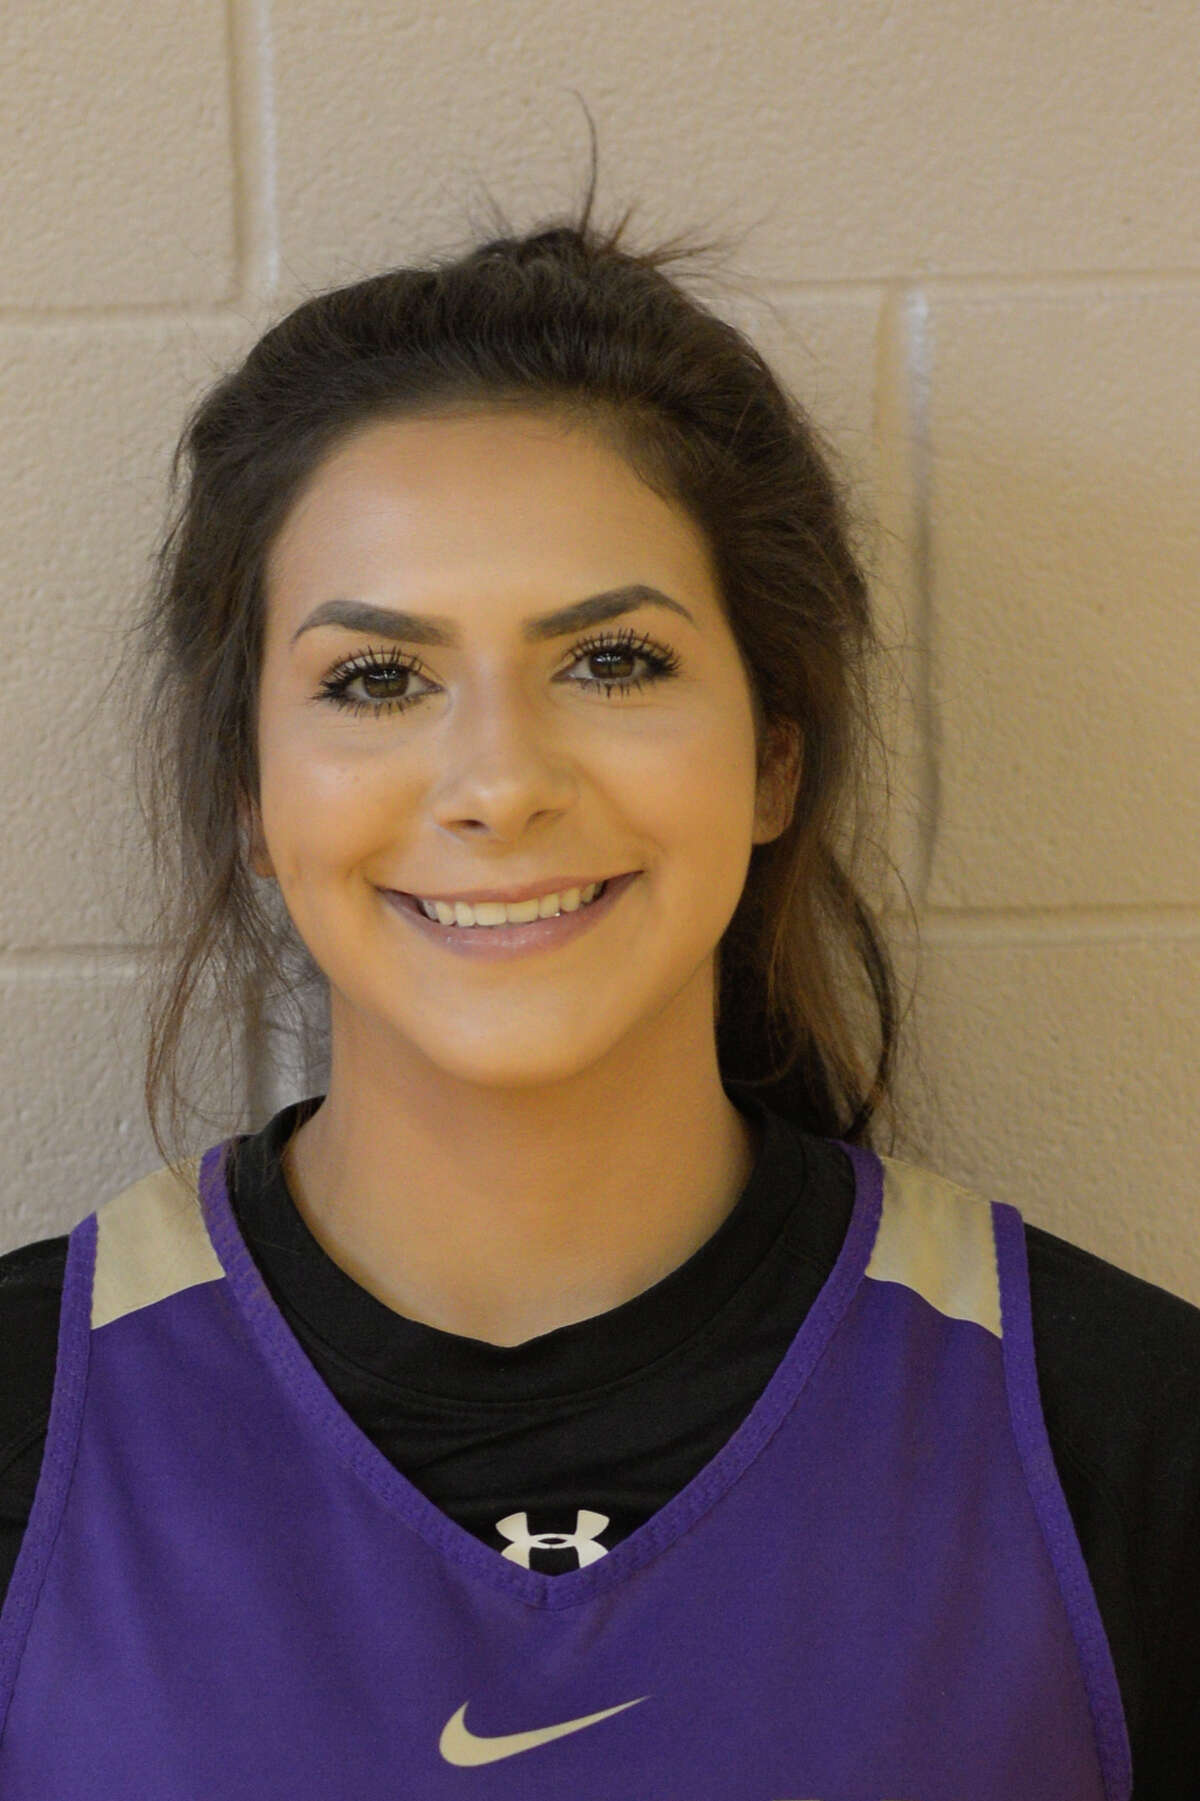 Midland High girls basketball player Brittney Garza photographed Thursday, Nov. 3, 2016. James Durbin/Reporter-Telegram